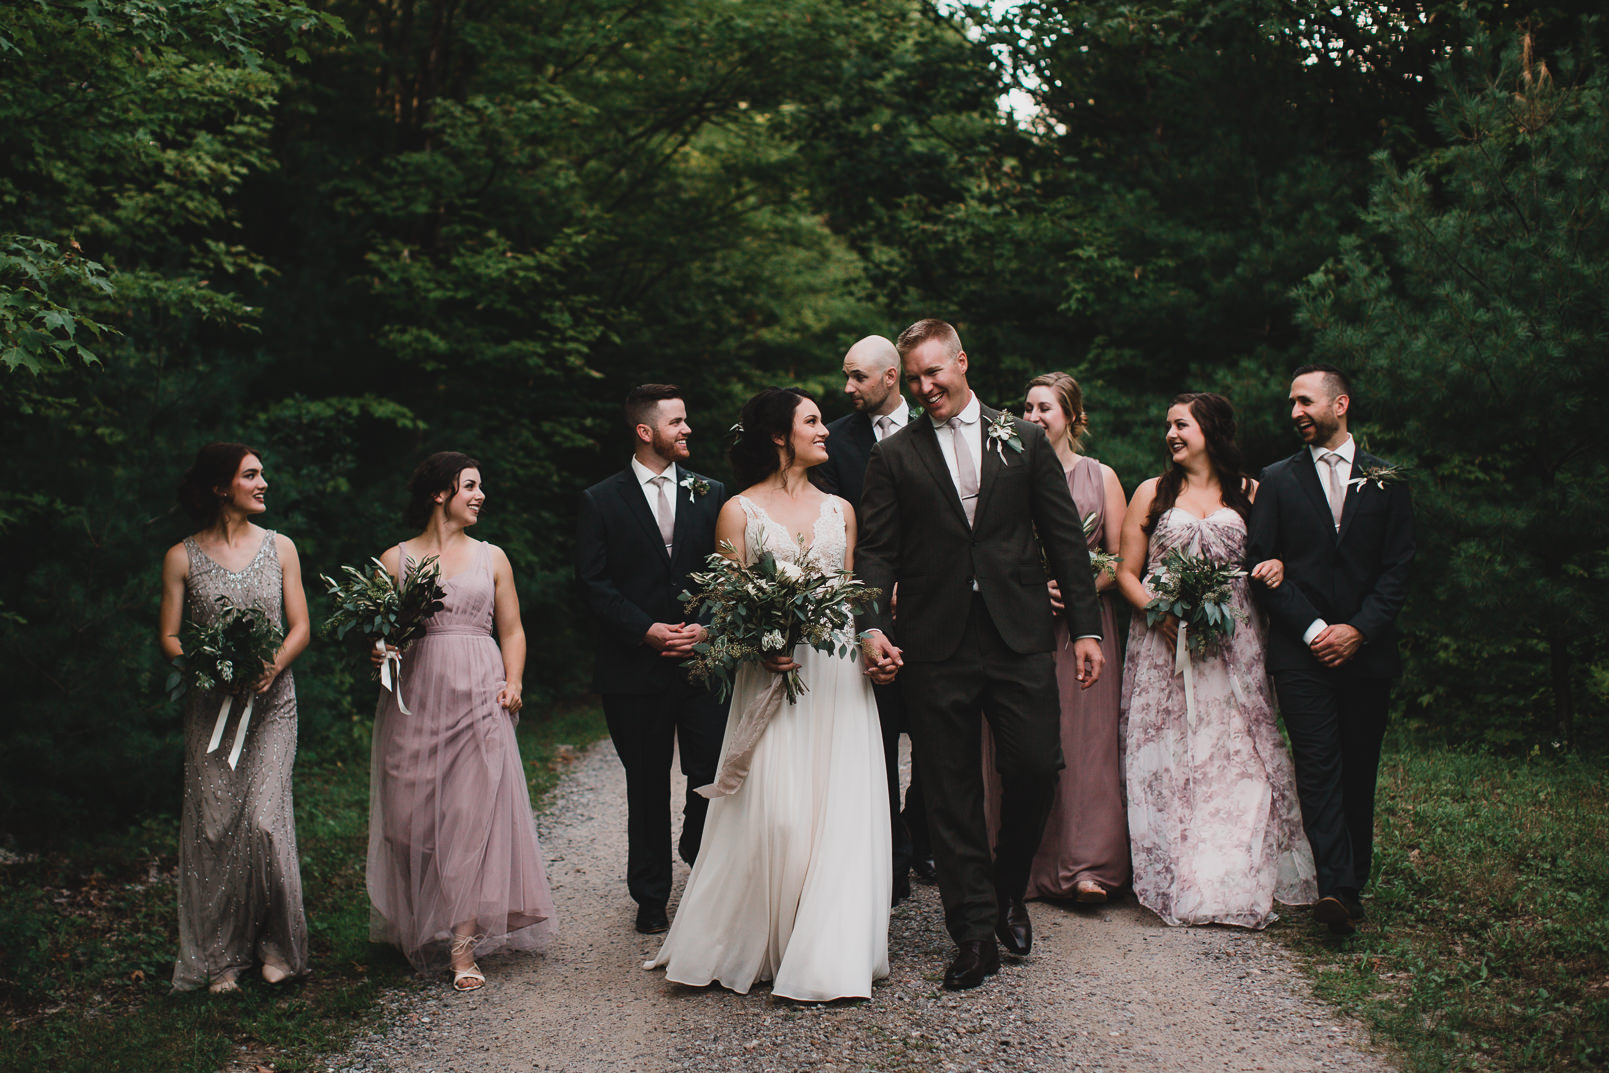 002-Jonathan-Kuhn-Photography-Wedding-_mini.jpg